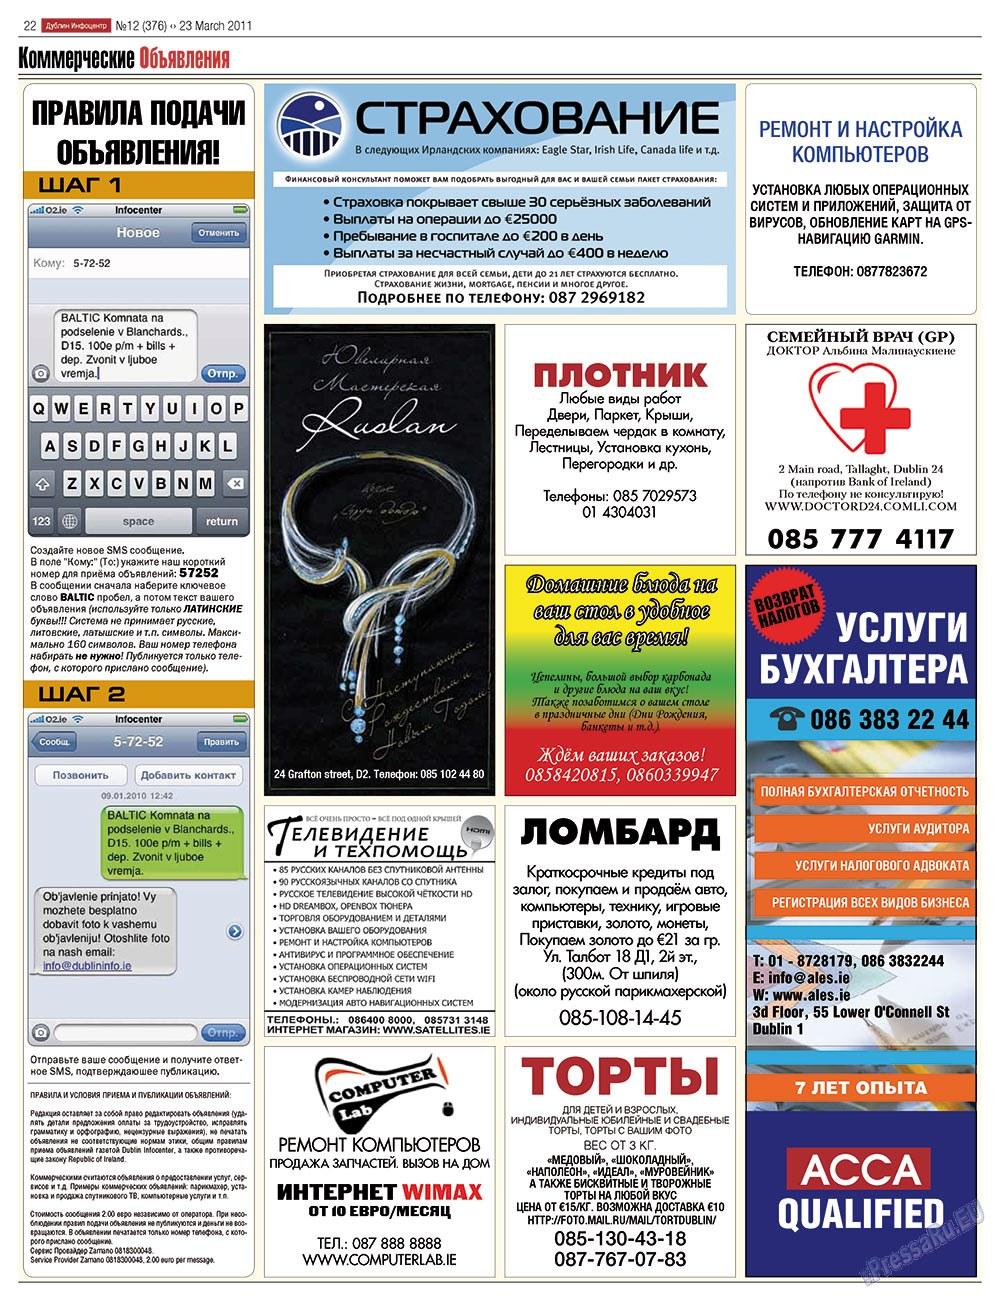 Дублин инфоцентр (газета). 2011 год, номер 12, стр. 22